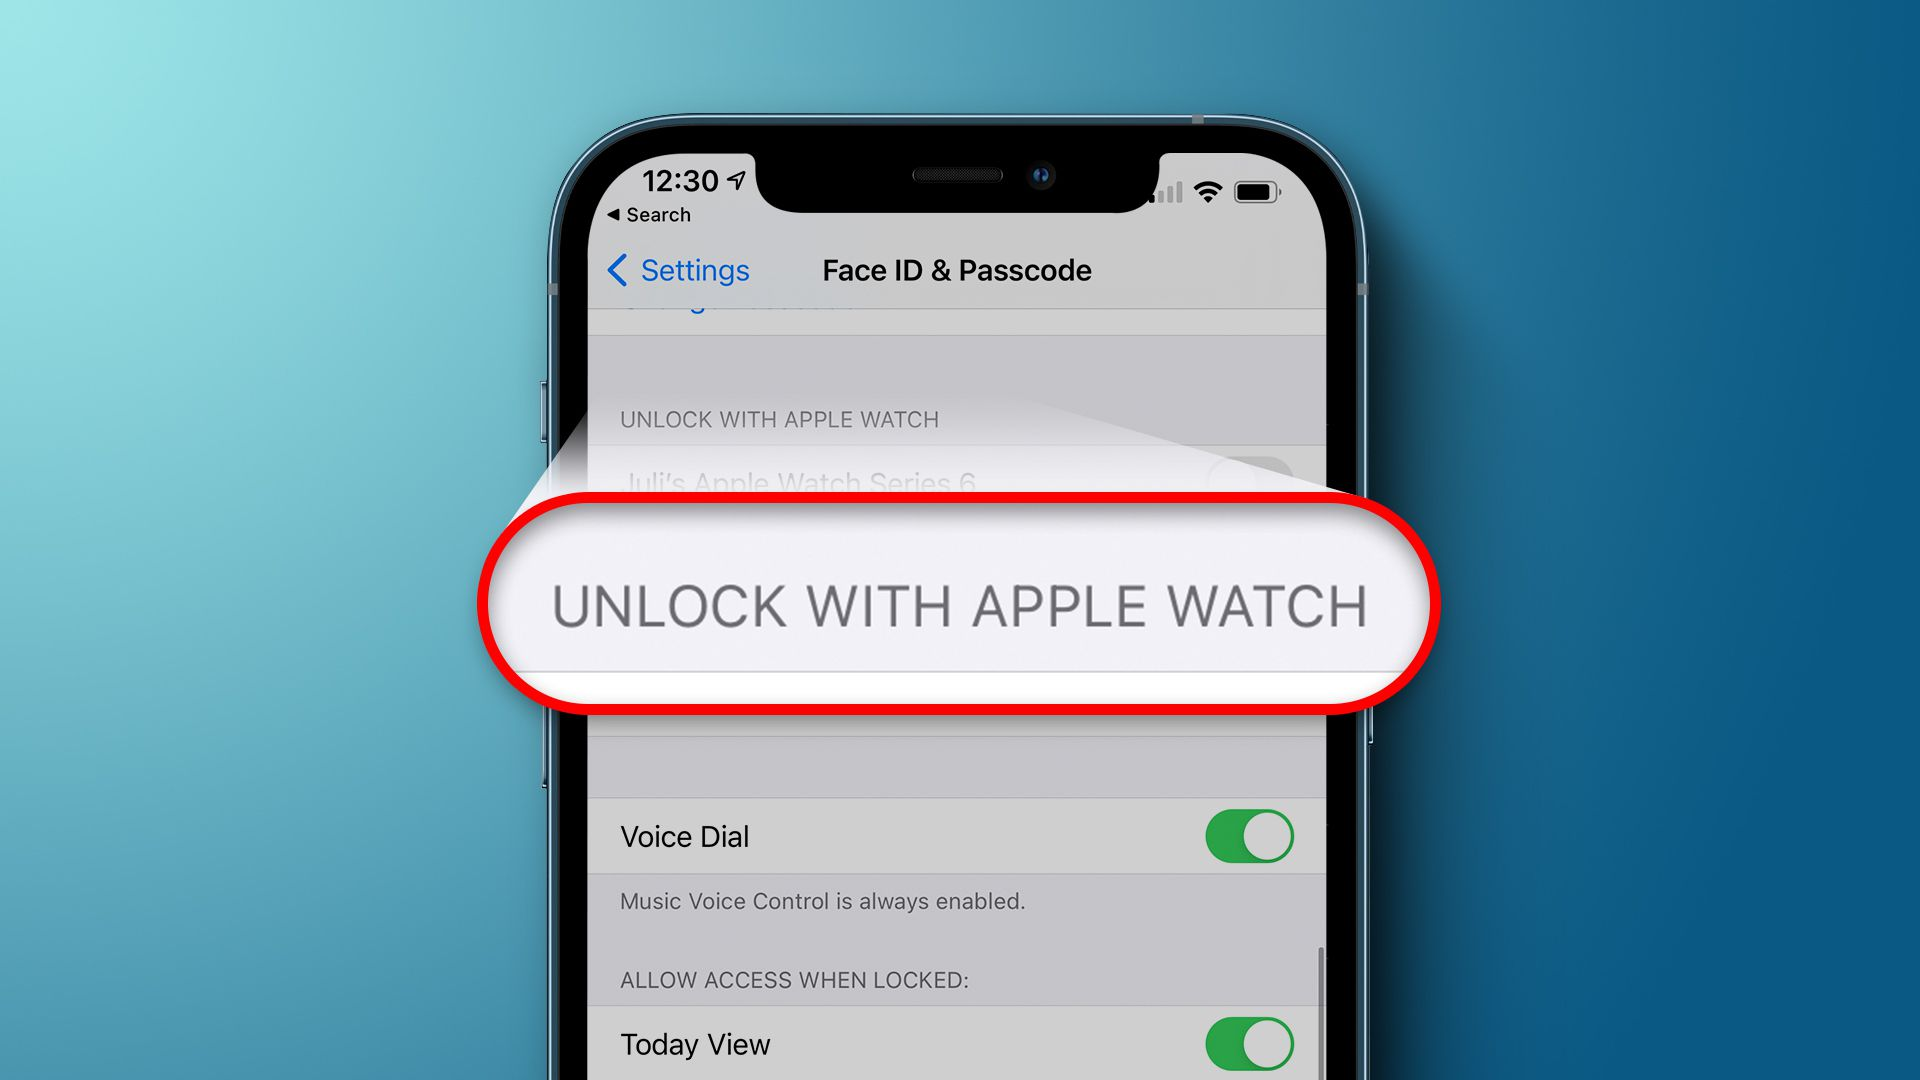 Unlock-With-Apple-Watch-Feature.jpg